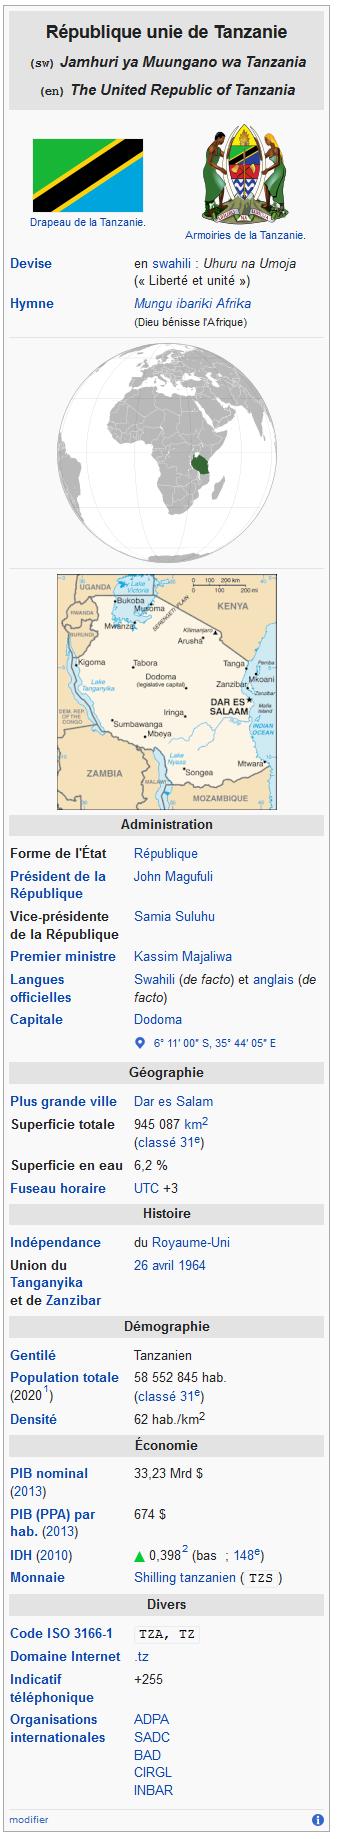 Screenshot_2020-05-05_Tanzanie_—_Wikip